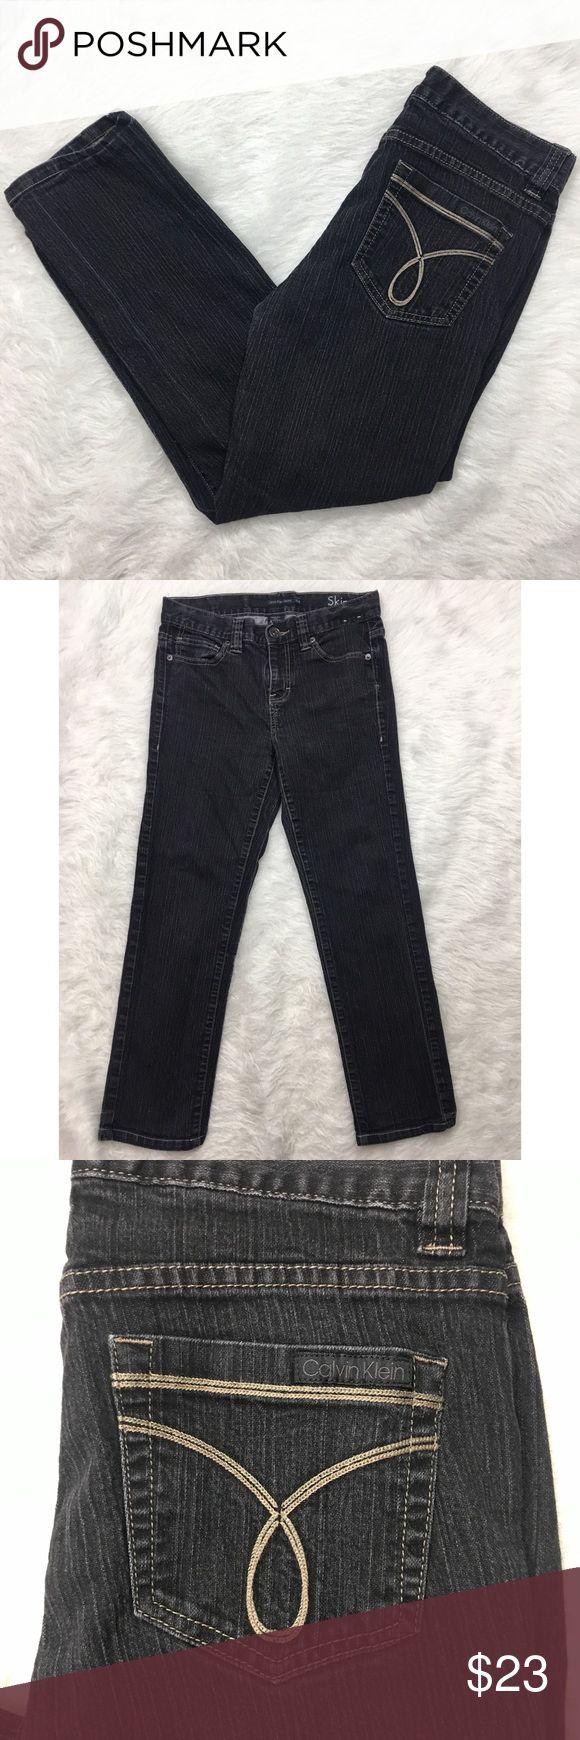 Skinny jeans 34 length